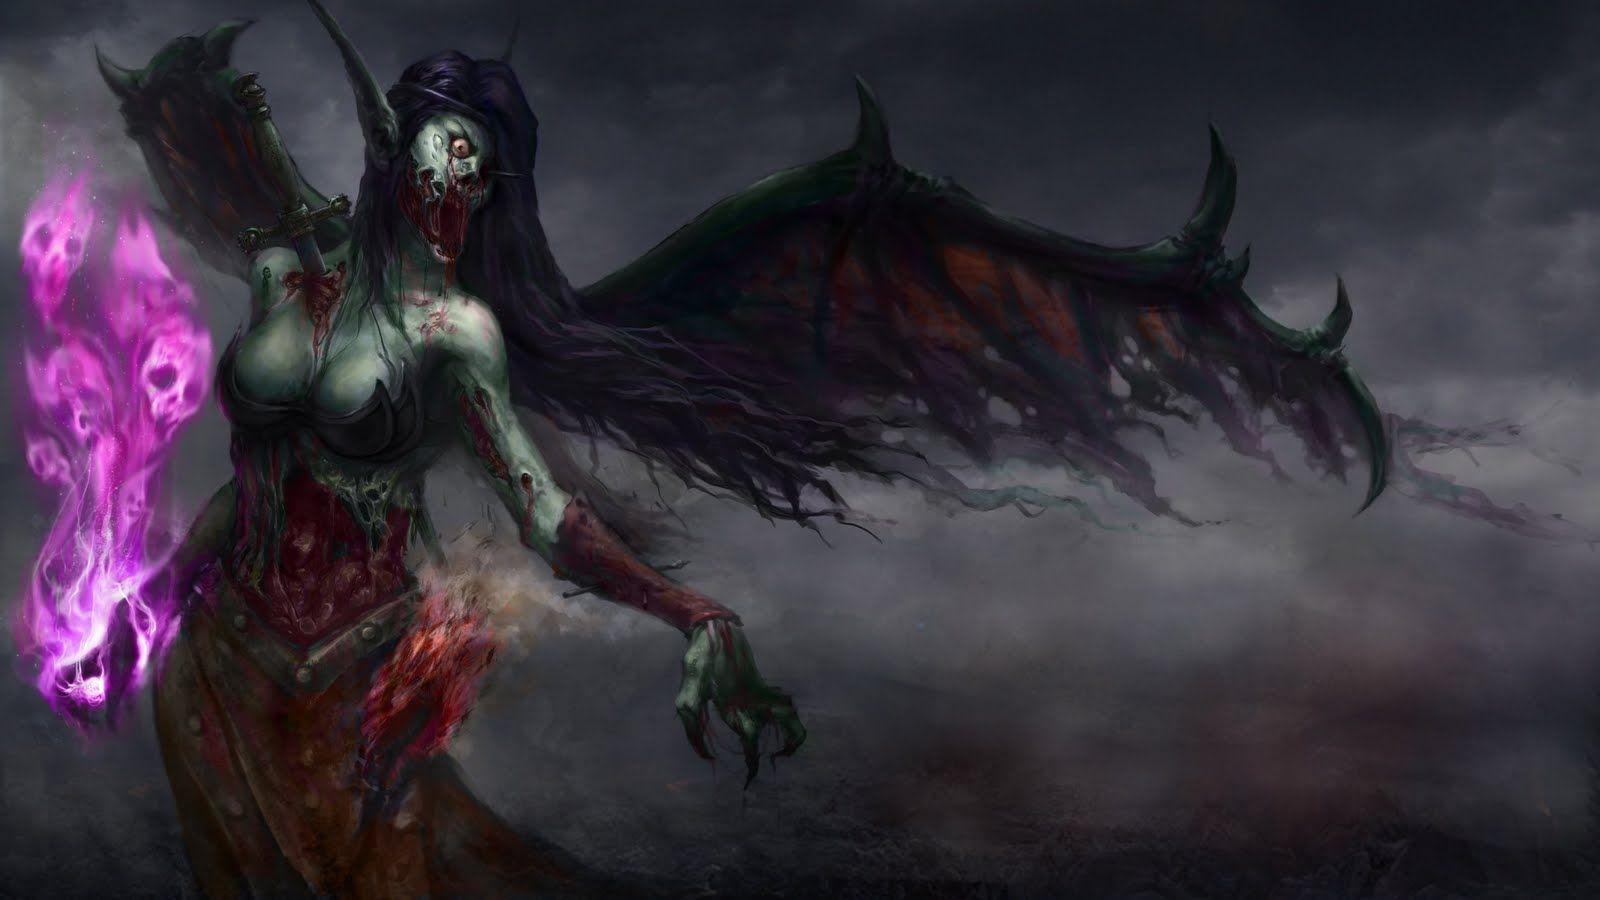 Dark Vampire Morgana Wallpaper Bite Me Vampires And Werewolves